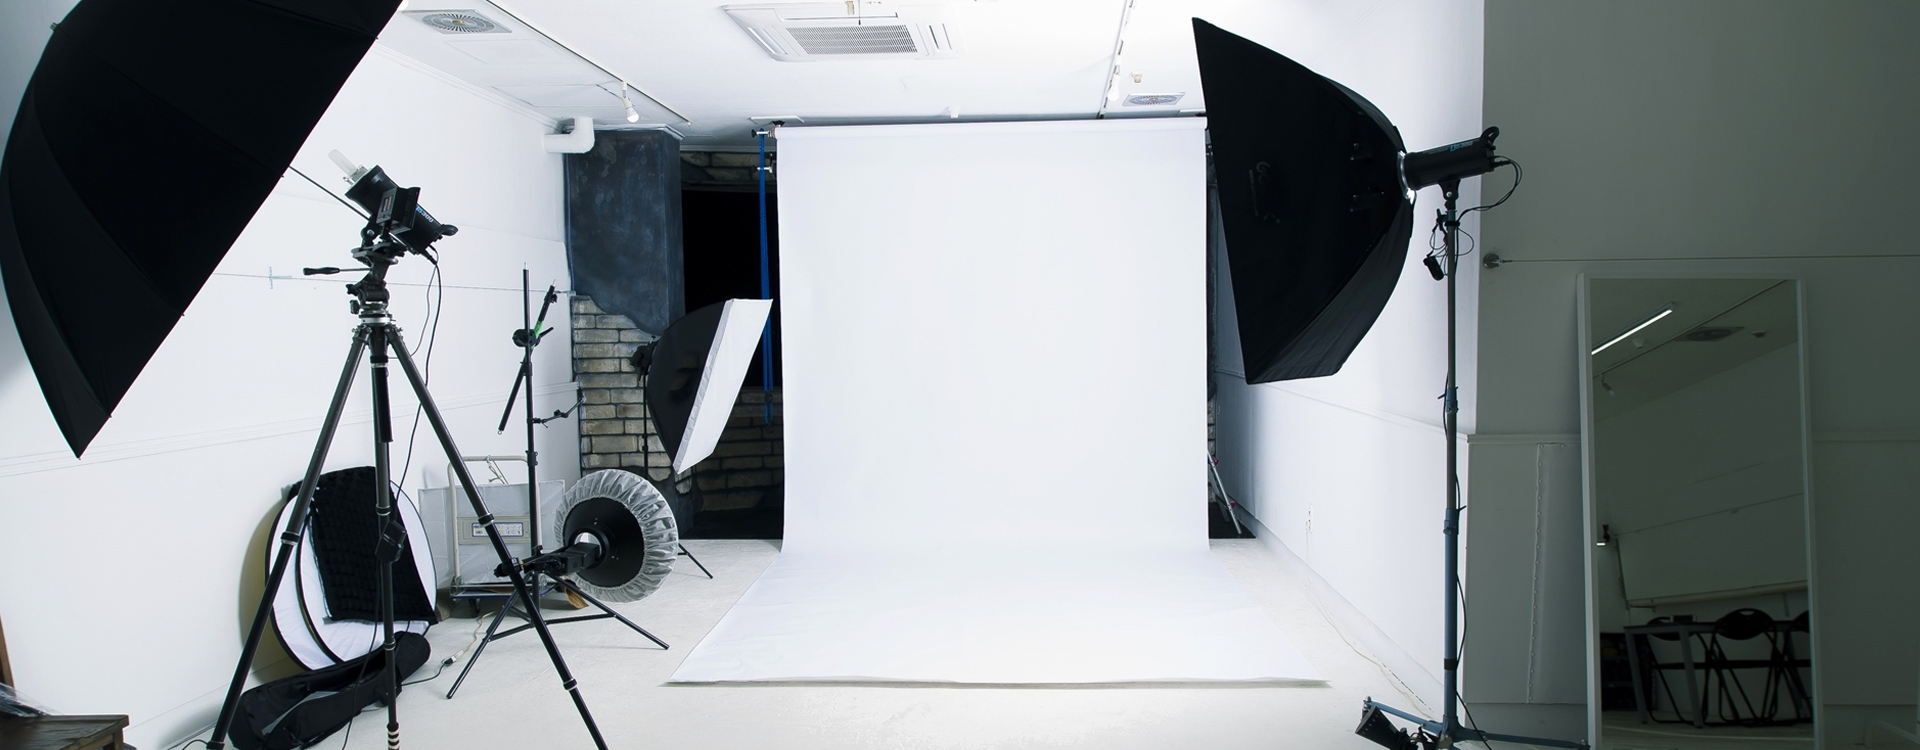 fotograf3